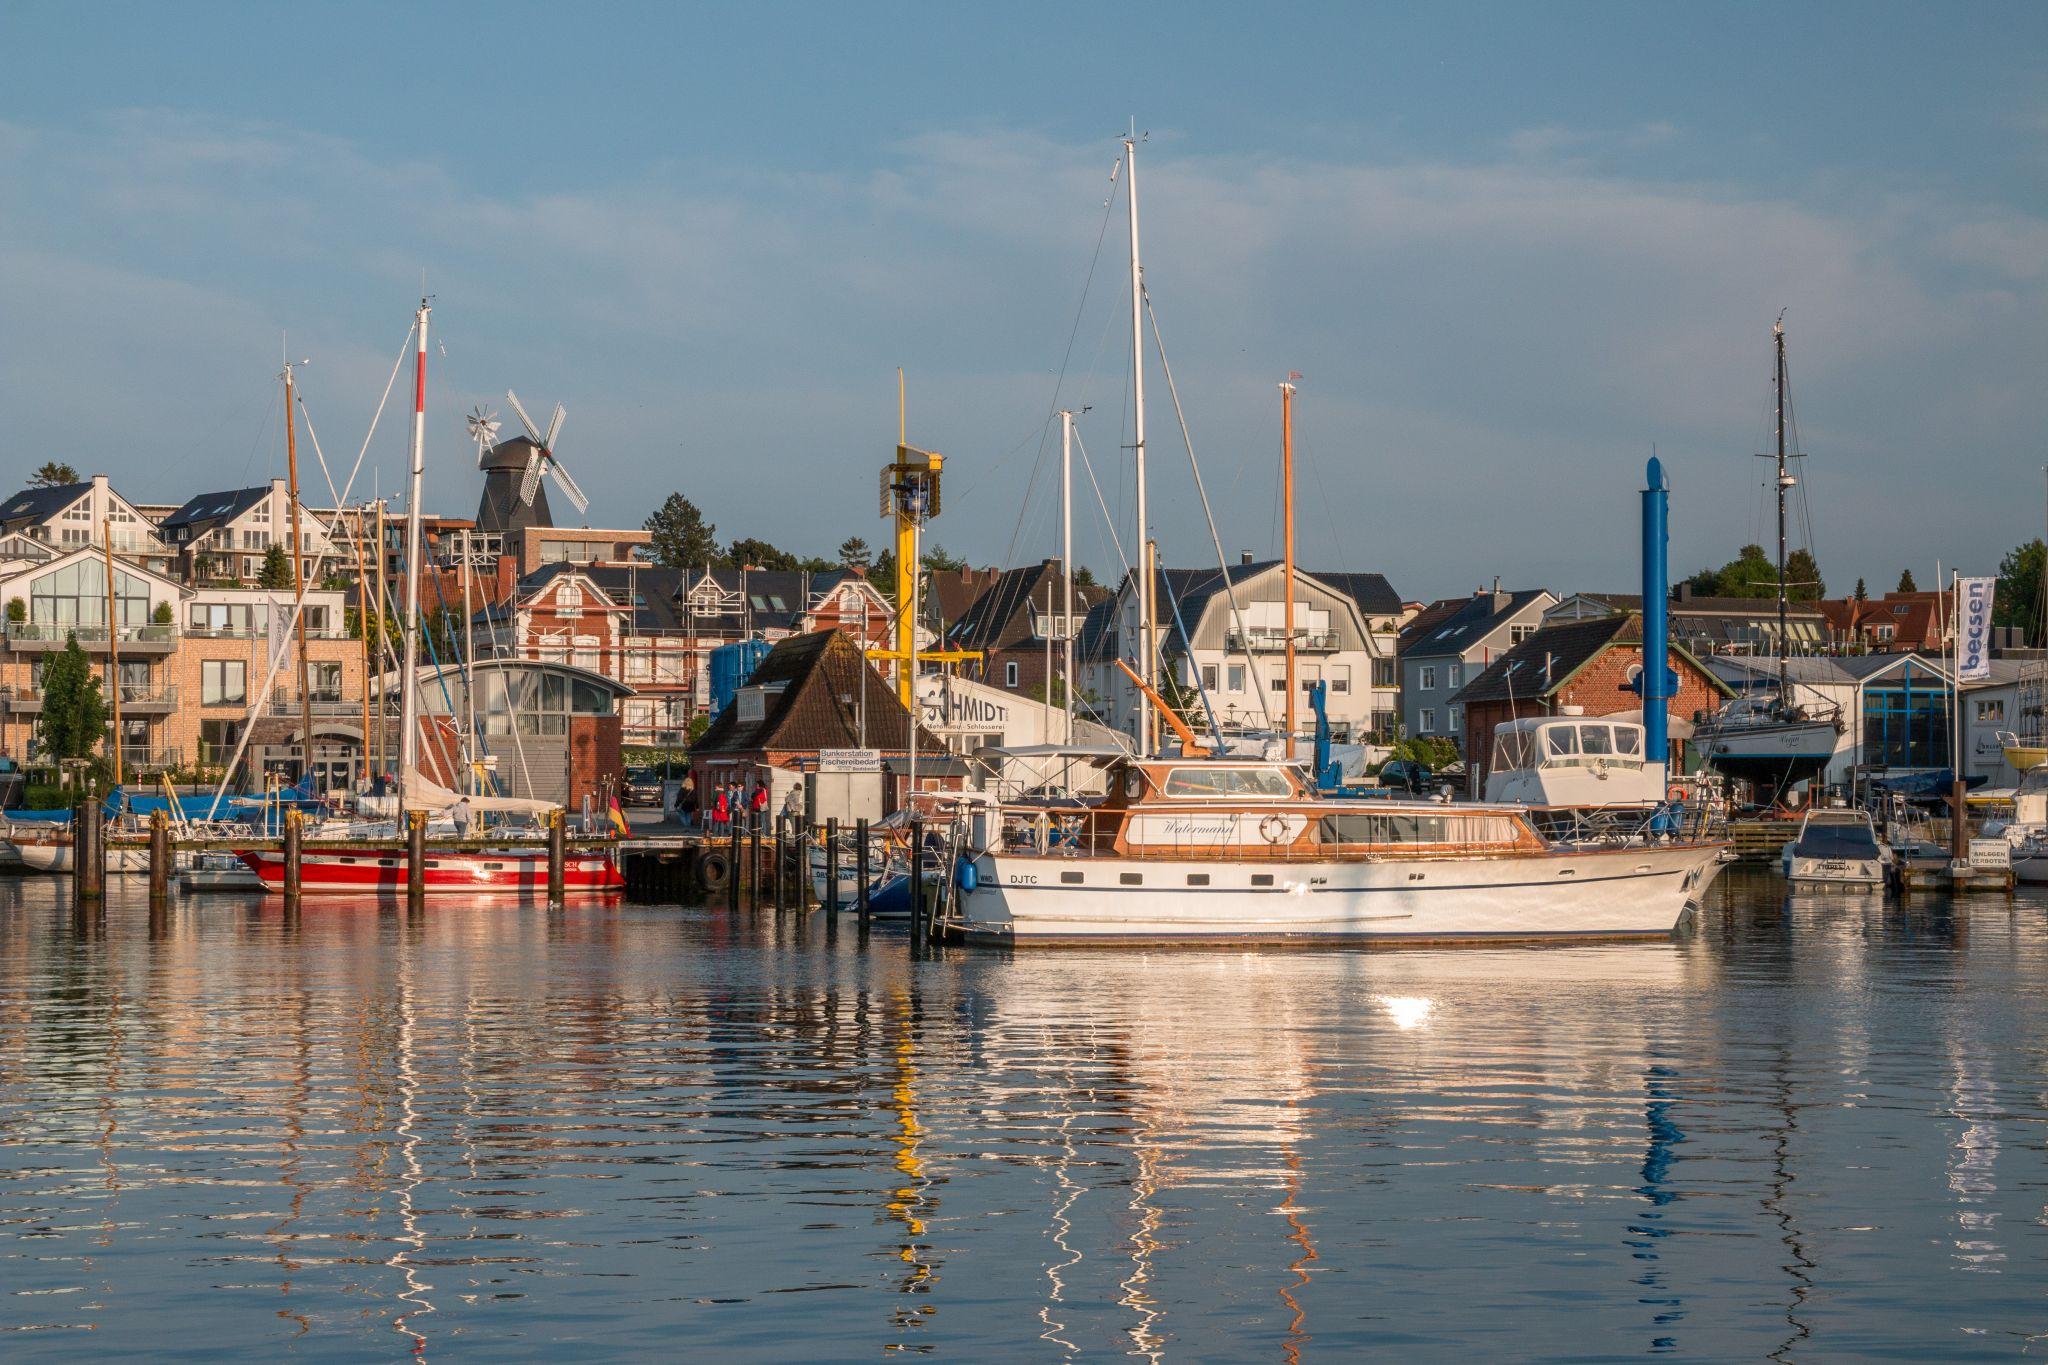 Harbor of Laboe, Germany